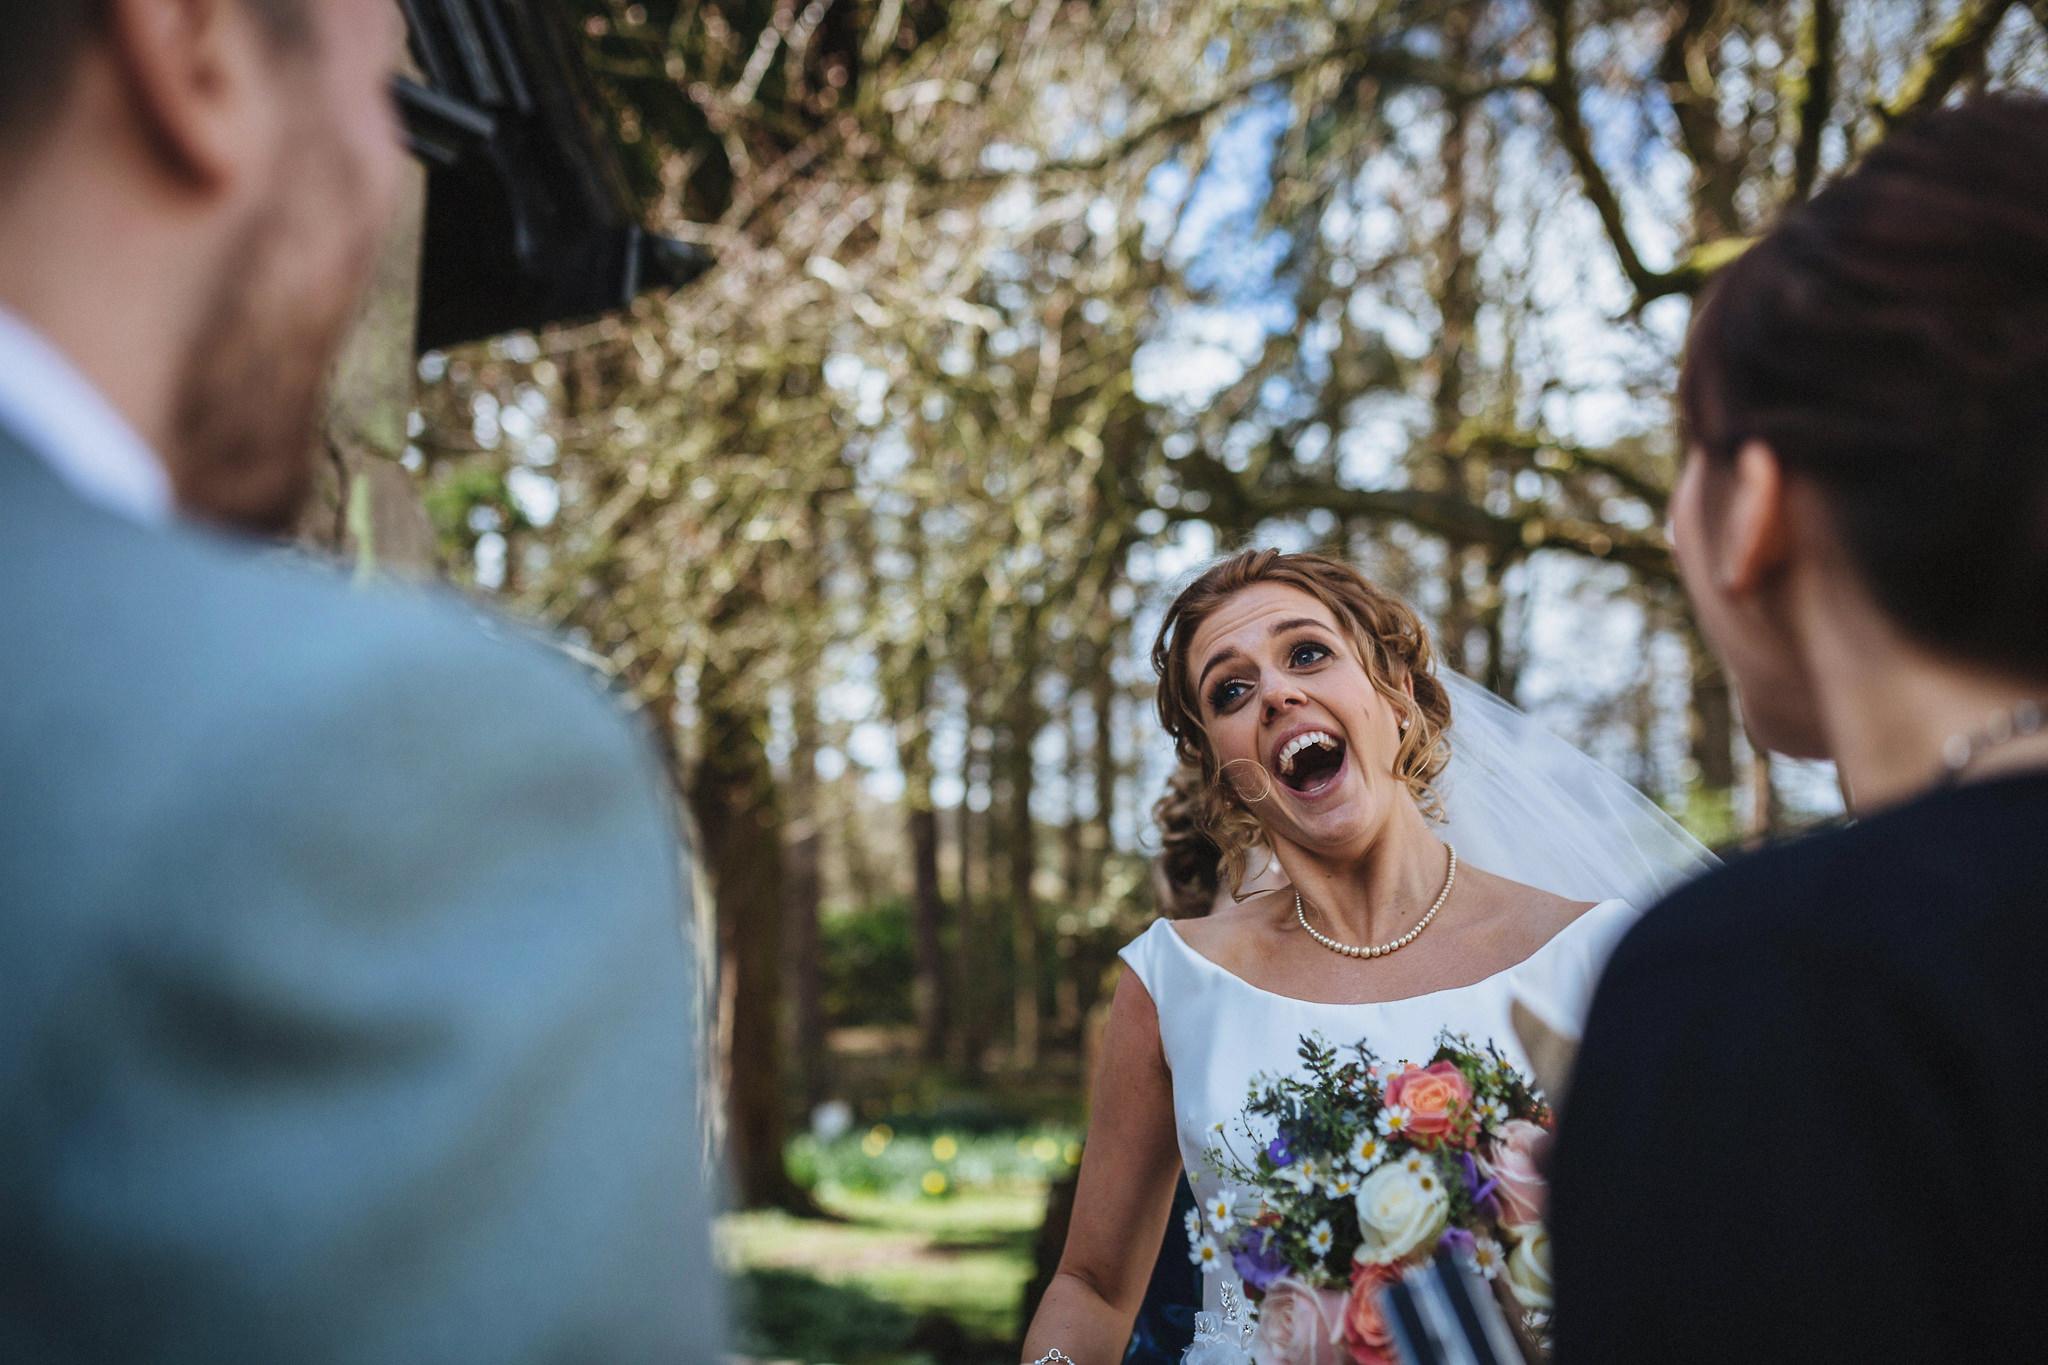 Lancashire-Creative-natural-documentary-wedding-photography-90048